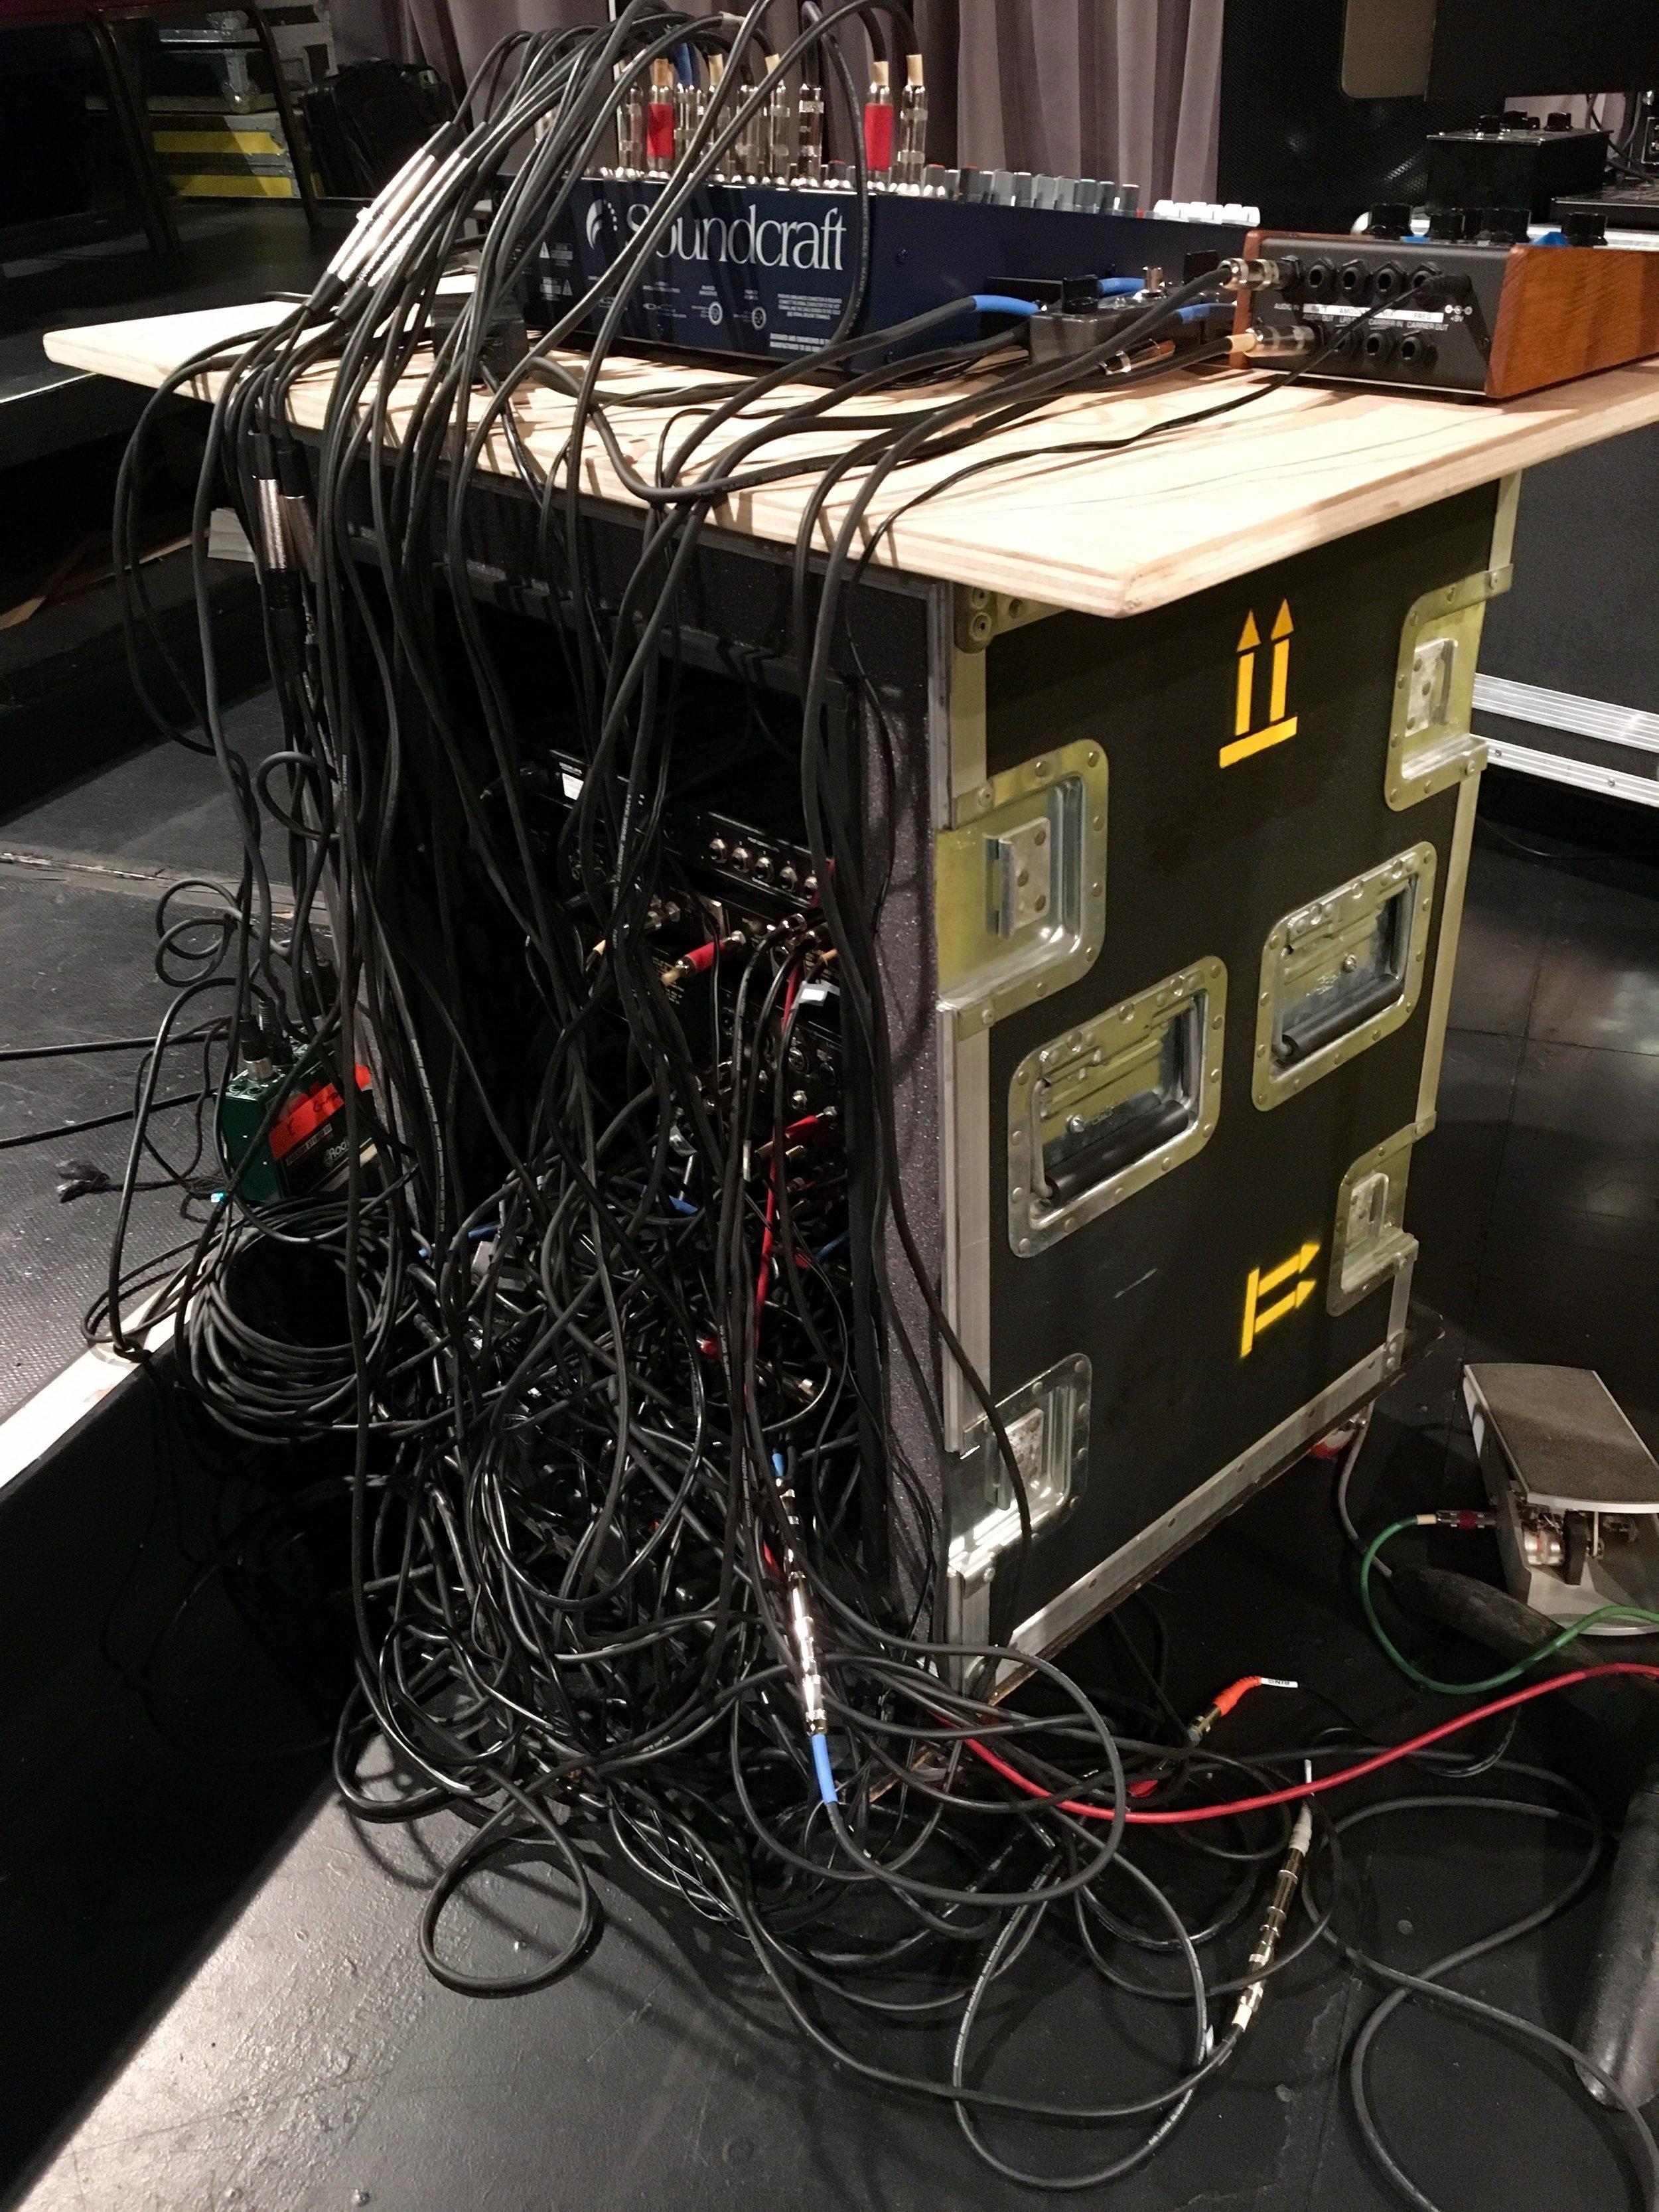 Rack wires.